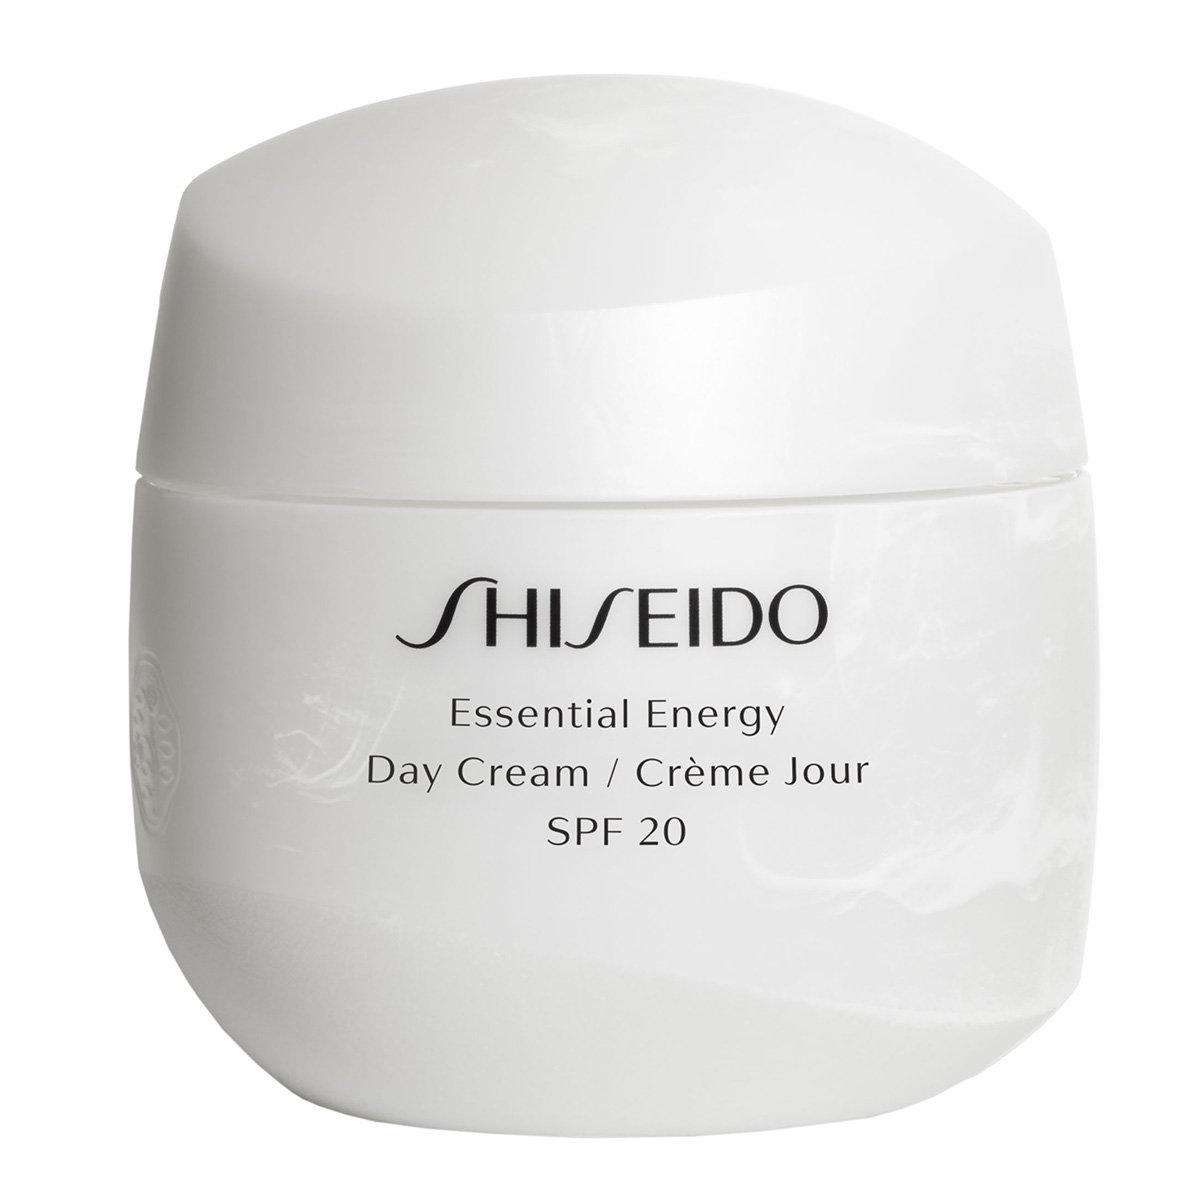 Shiseido - Essential Energy - Crème Jour SPF20 - 50 ml